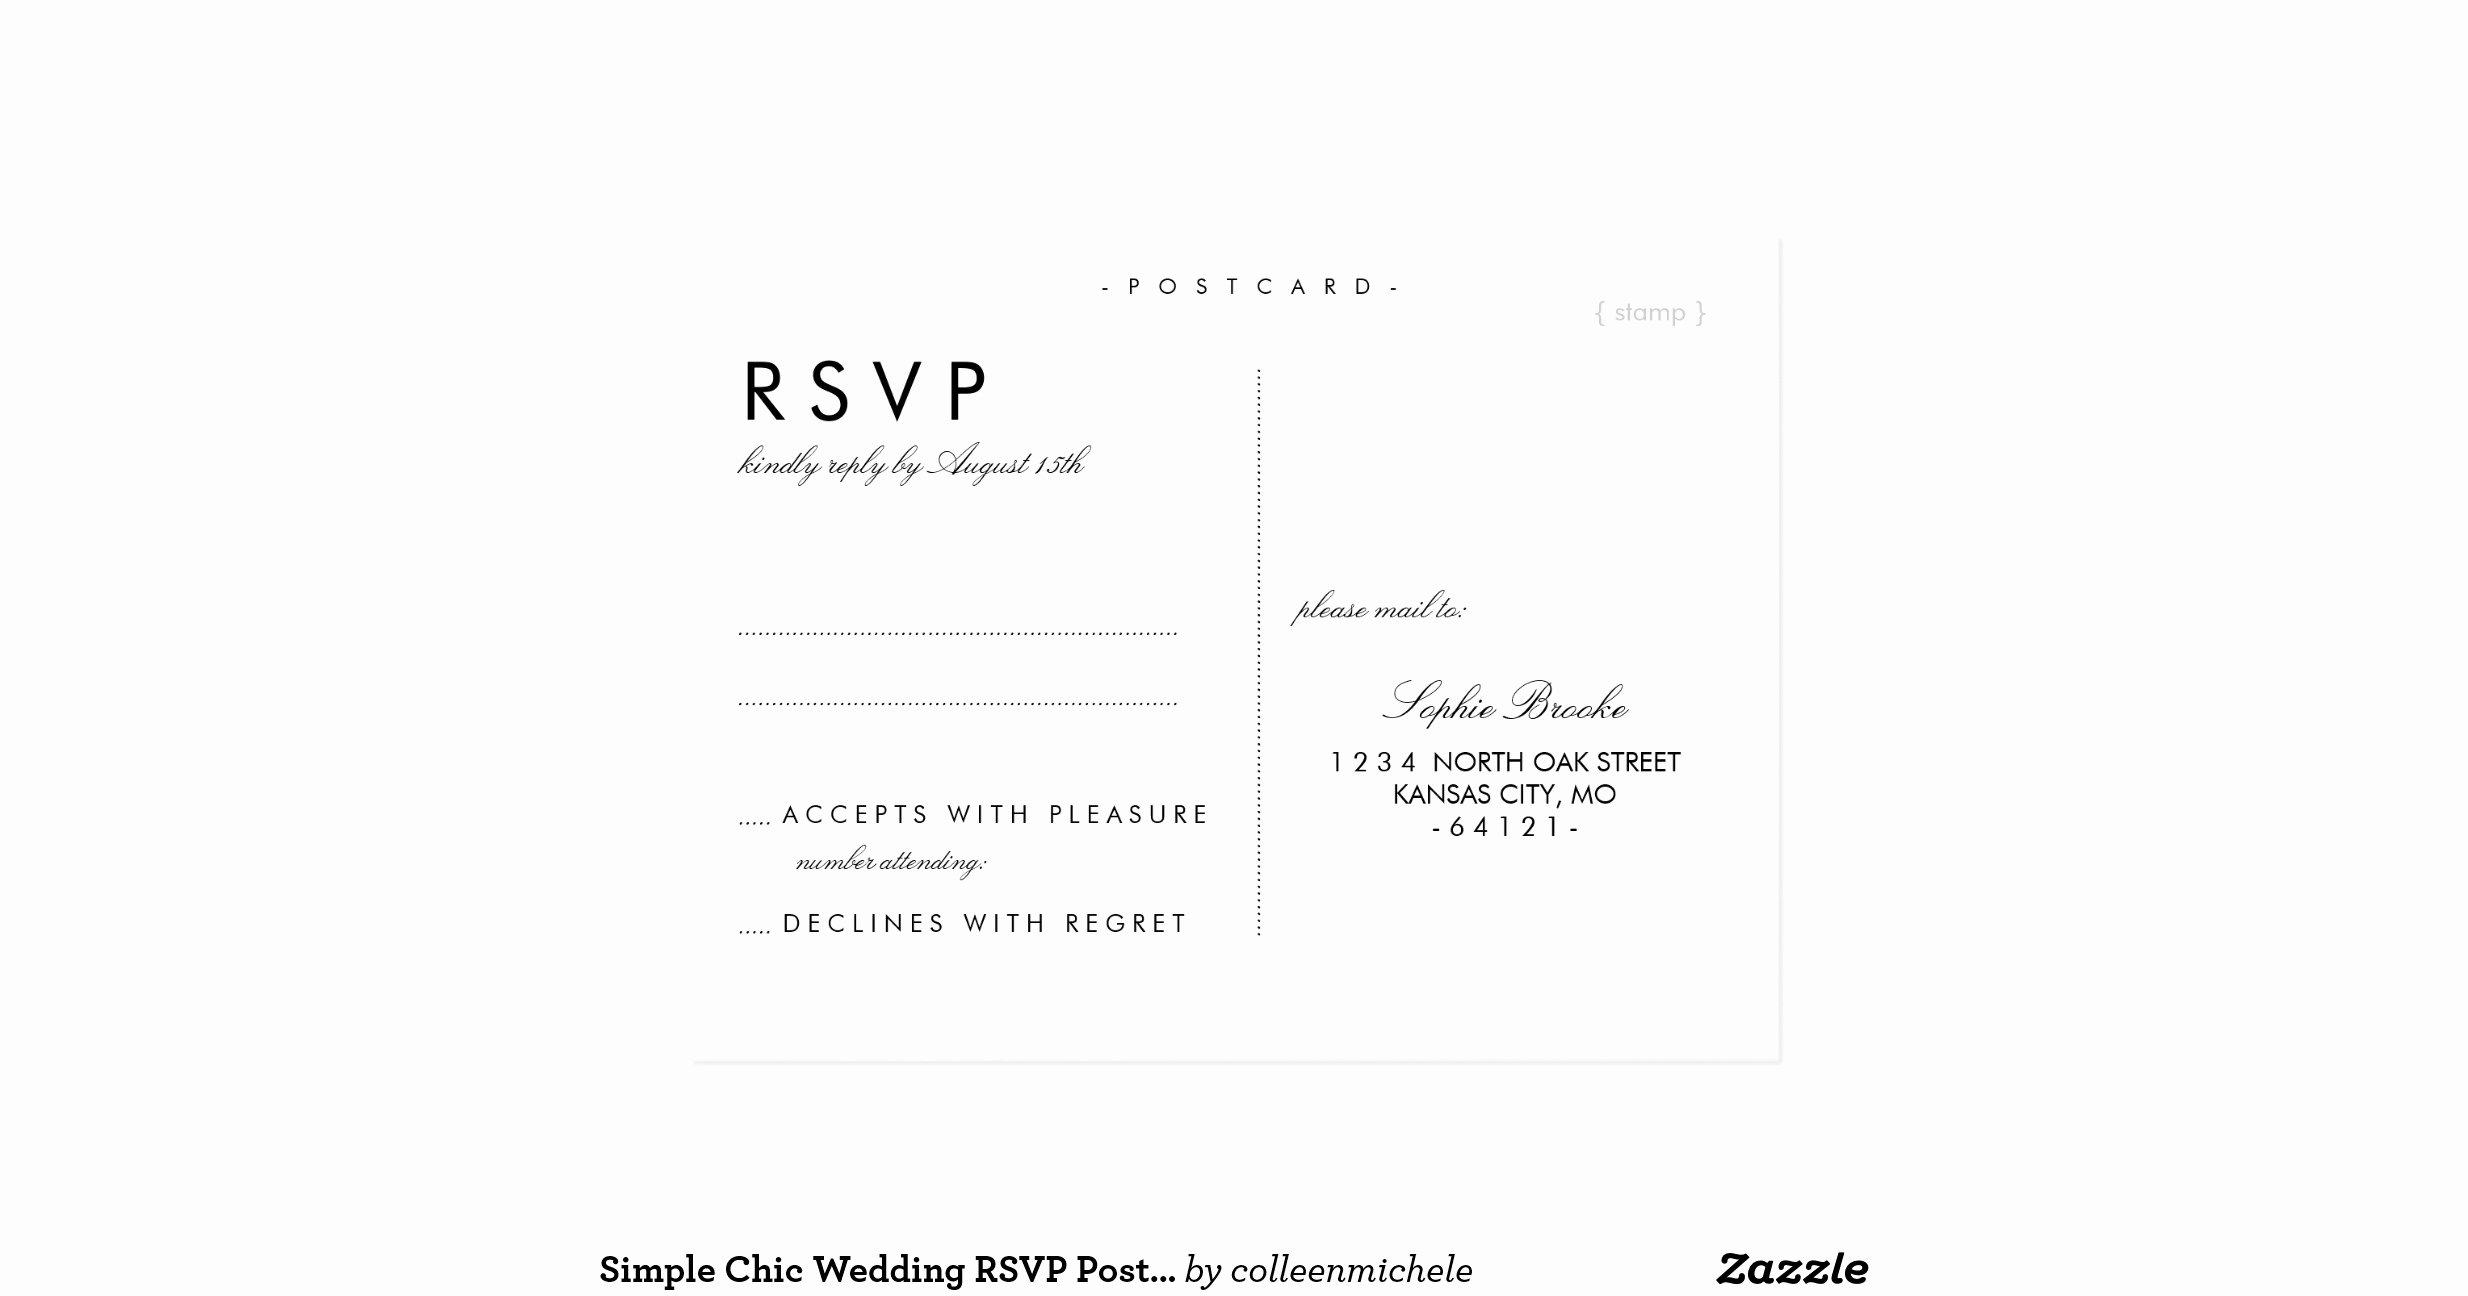 Wedding Rsvp Postcard Templates Inspirational Simple Chic Wedding Rsvp Postcard Template